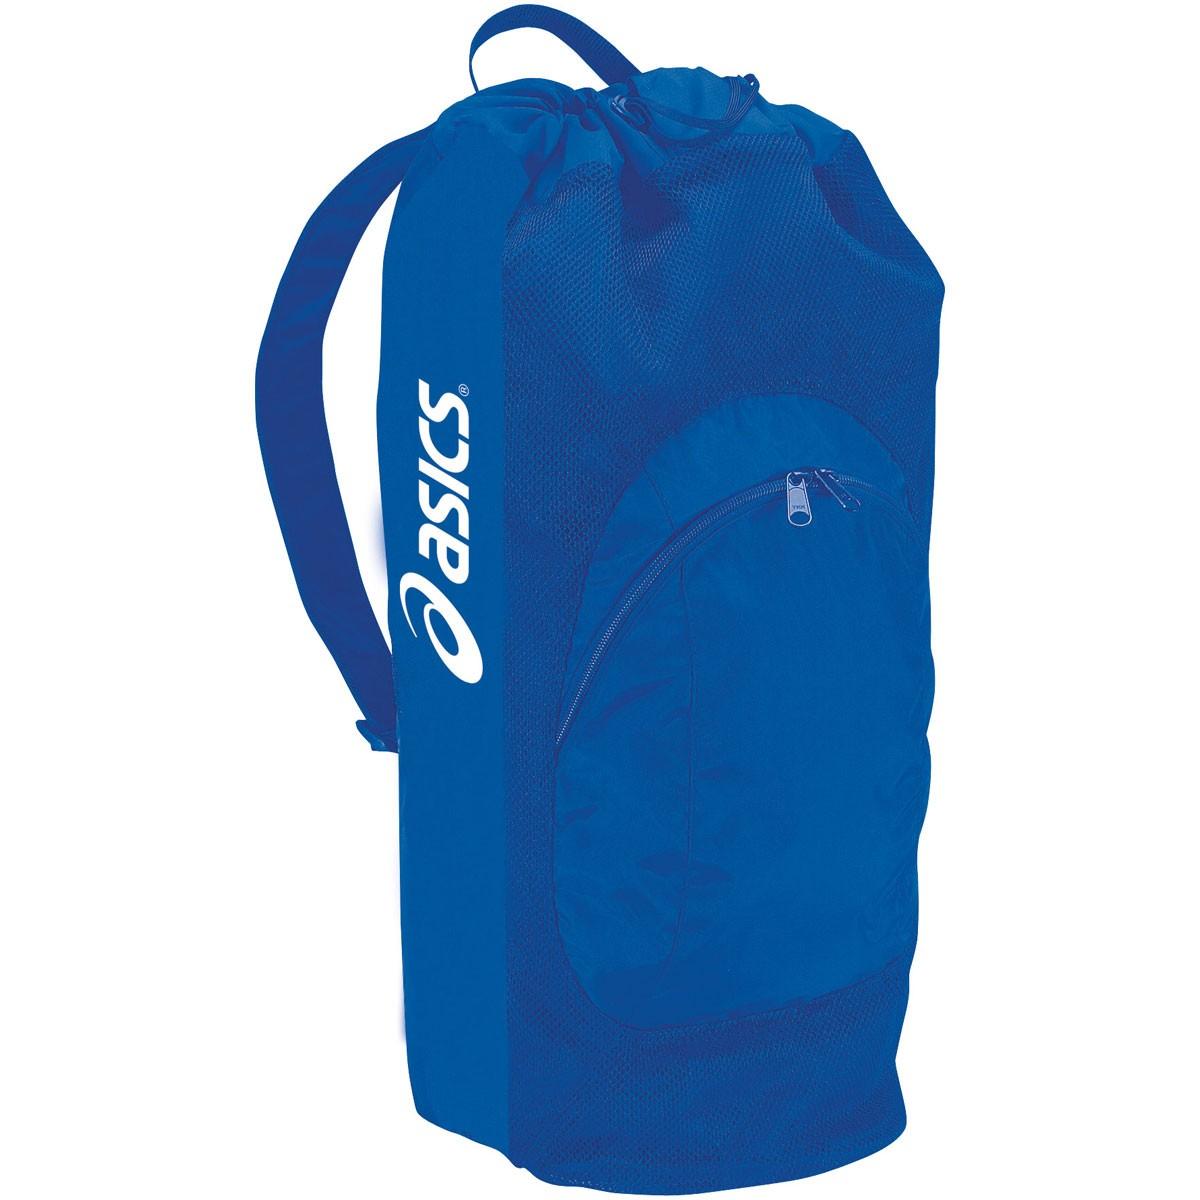 asics gear bag Blue